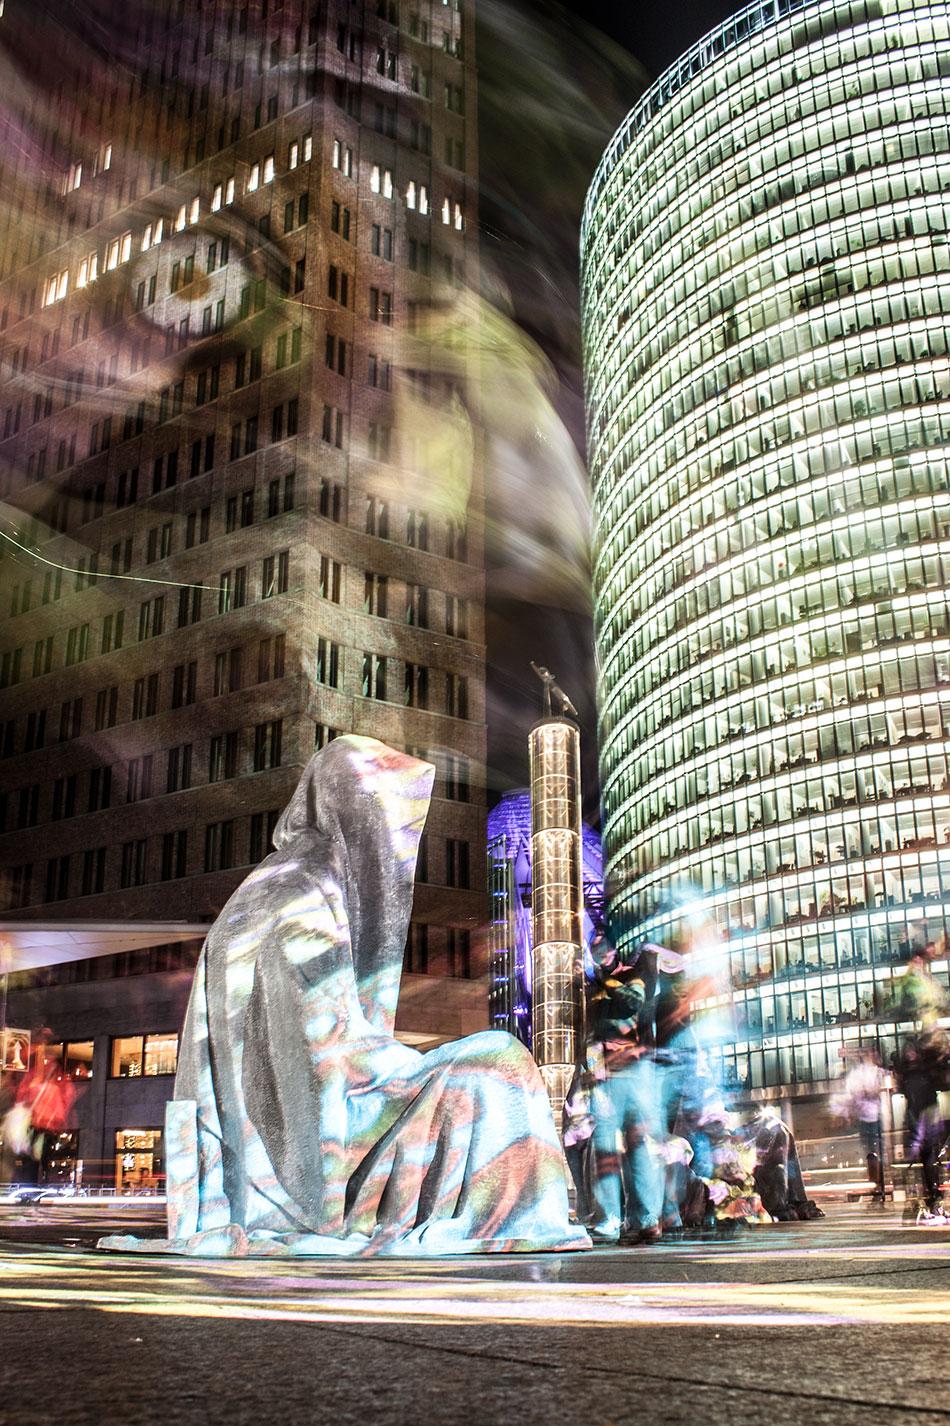 festival-of-lights-berlin-potzdamer-platz-light-art-show-exhibition-lumina-guardians-of-time-manfred-kili-kielnhofer-contemporary-arts-design-sculpture-3211